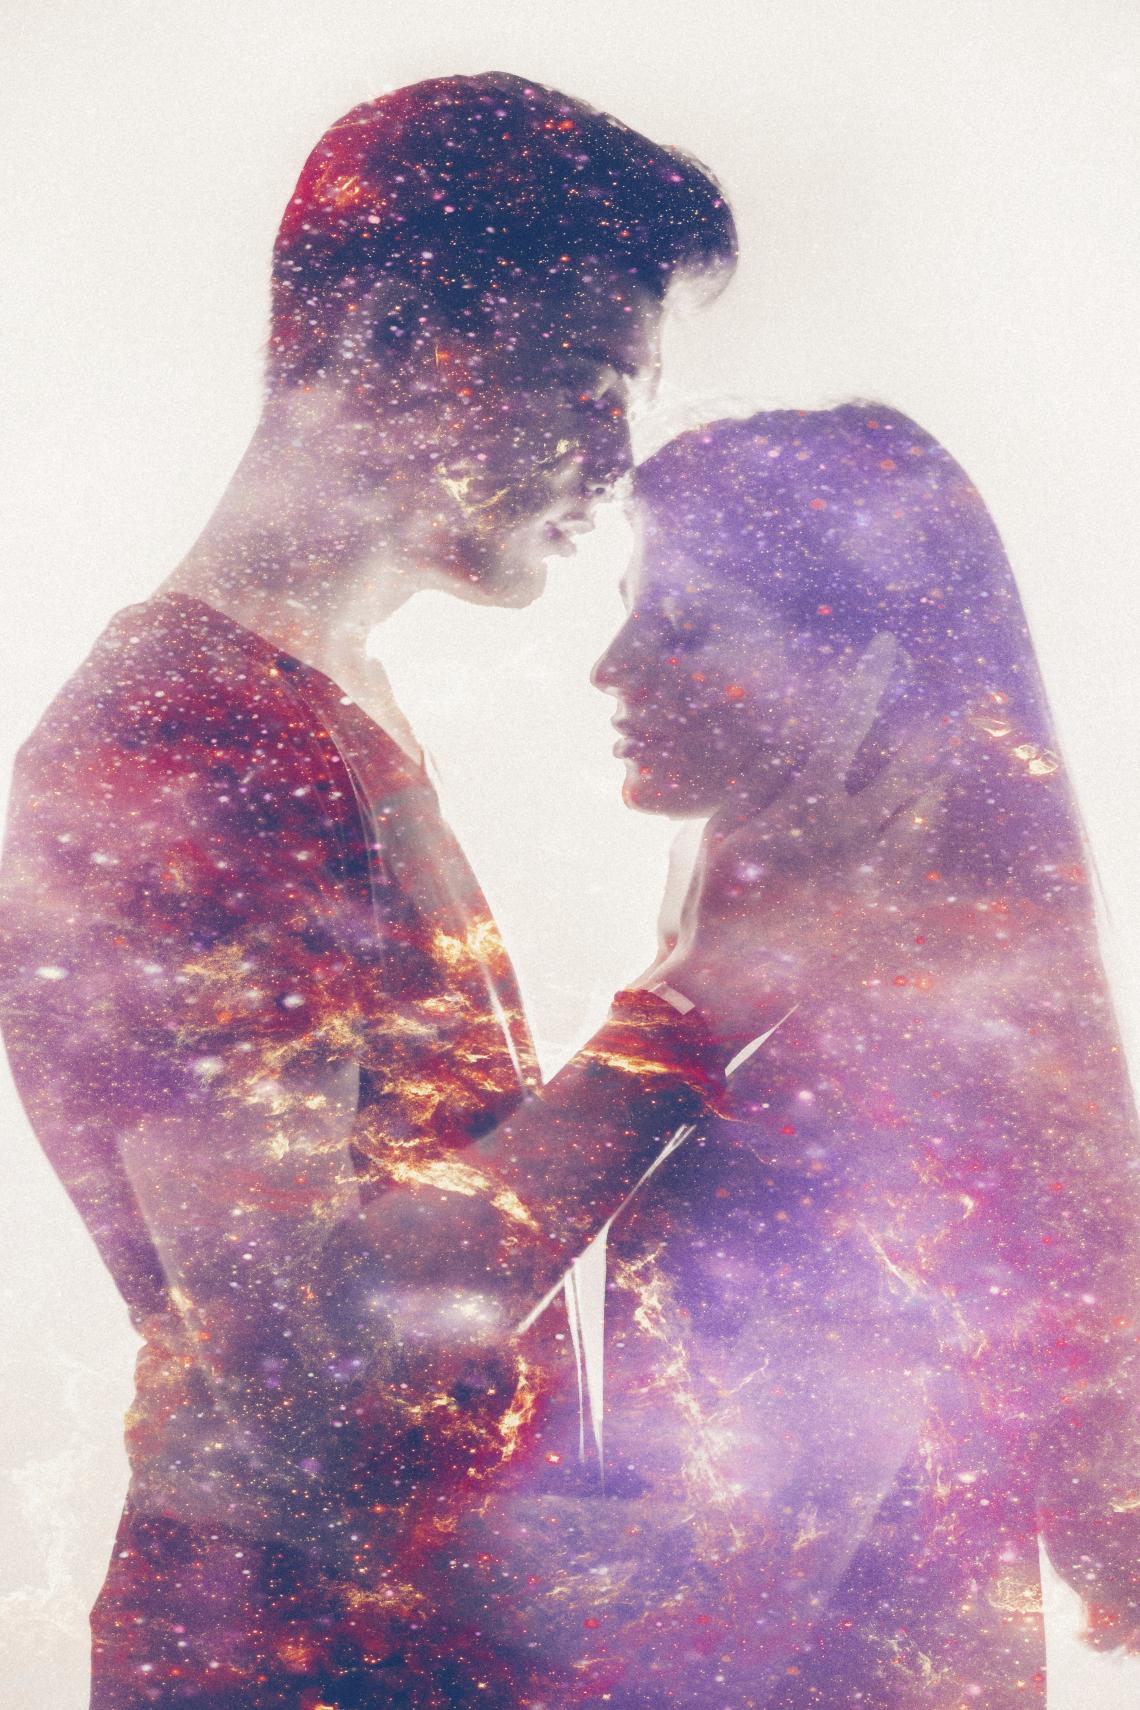 Картинка мужчина и женщина в космосе